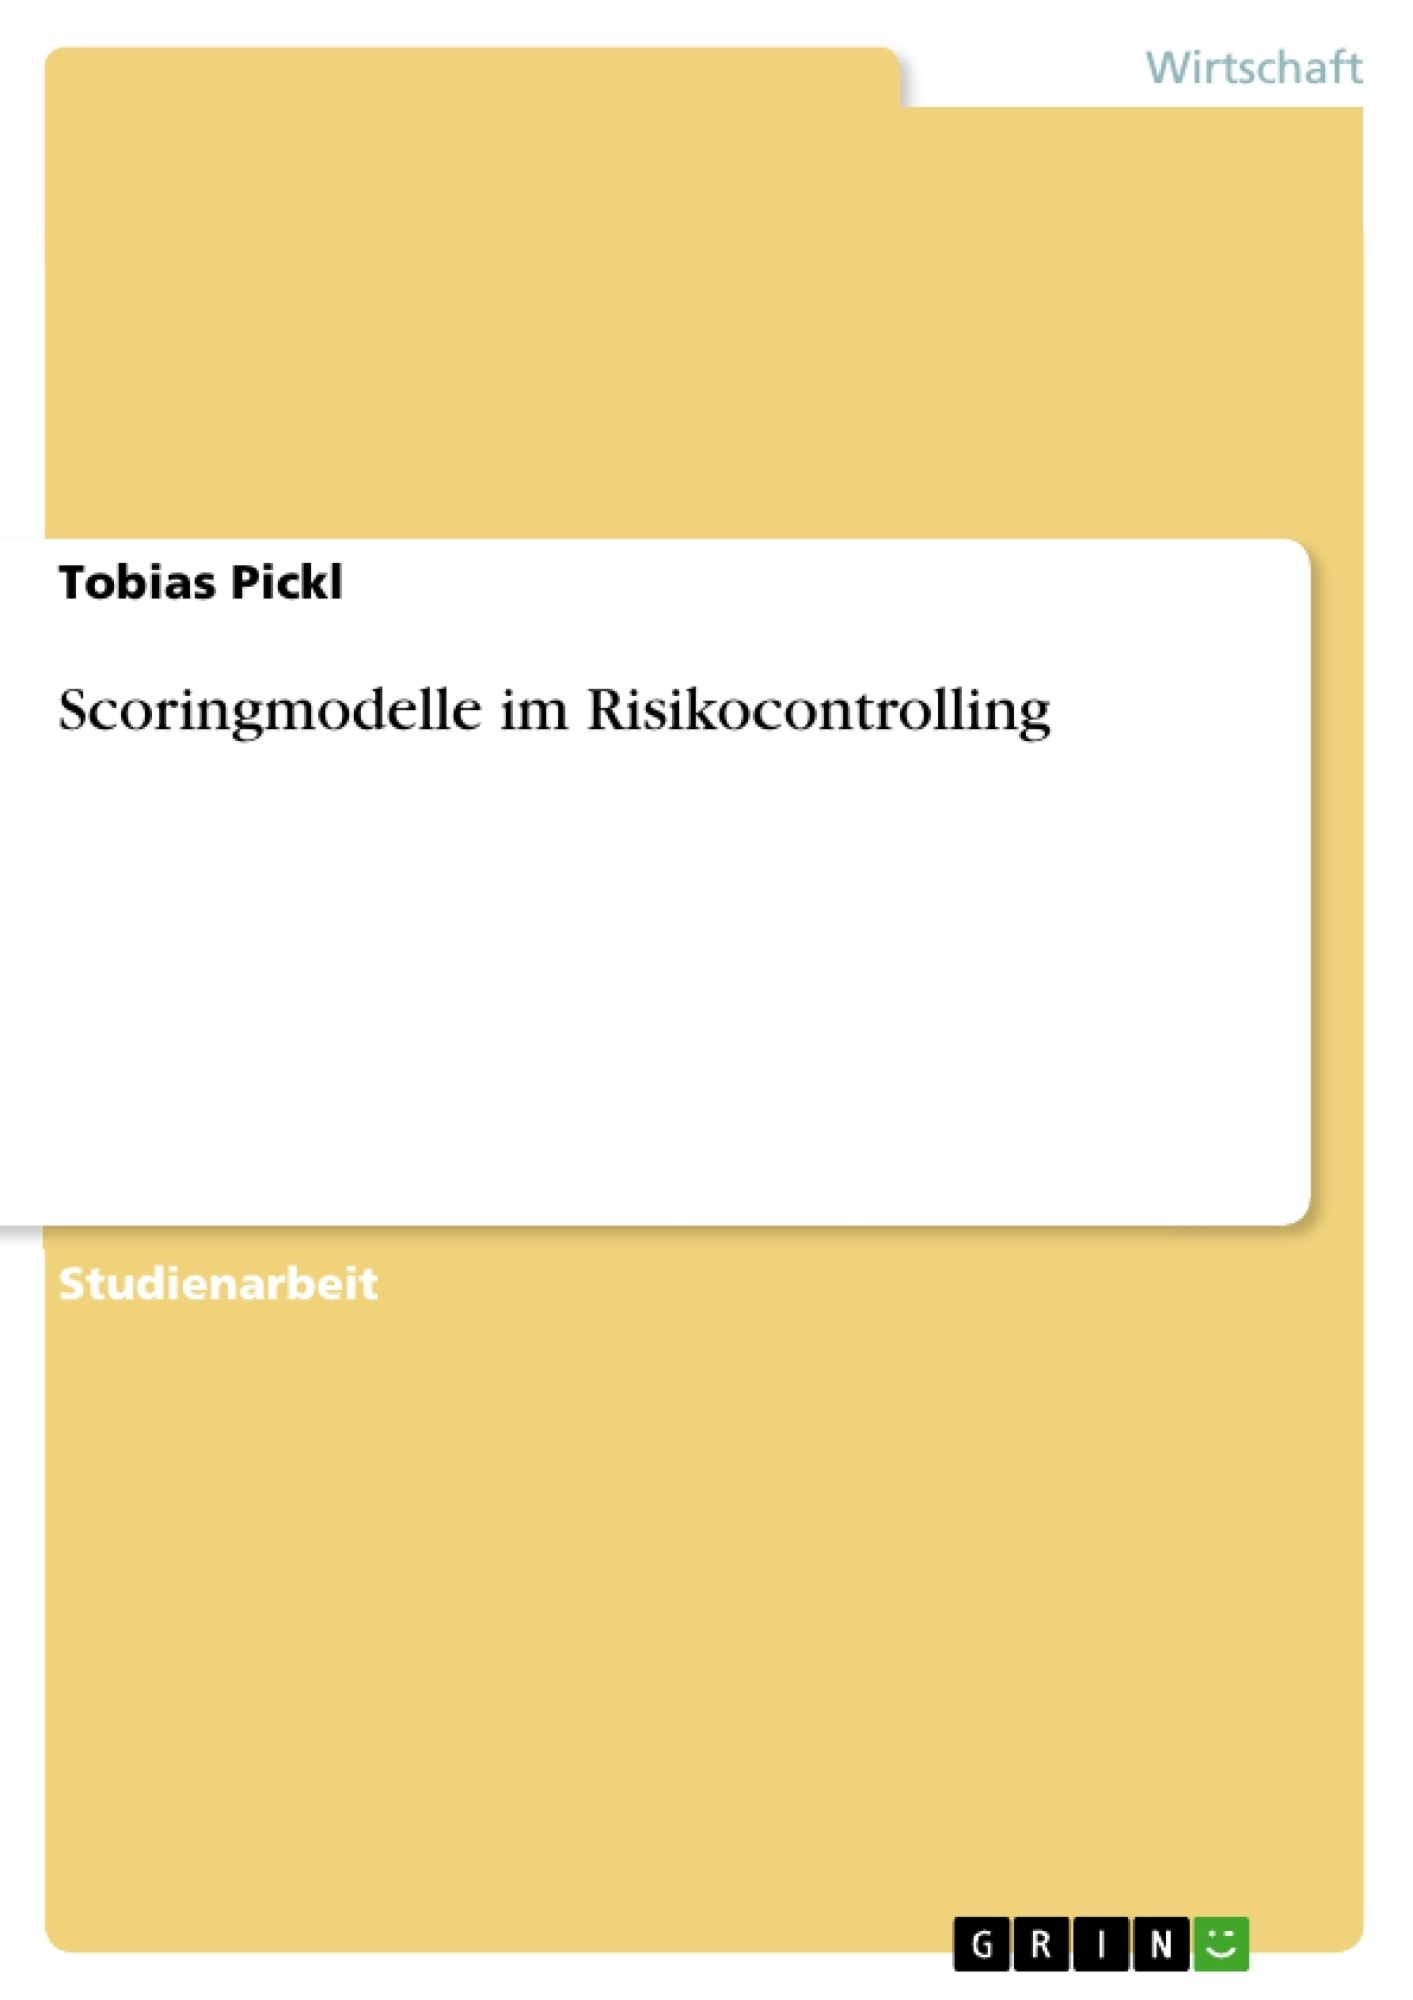 Titel: Scoringmodelle im Risikocontrolling